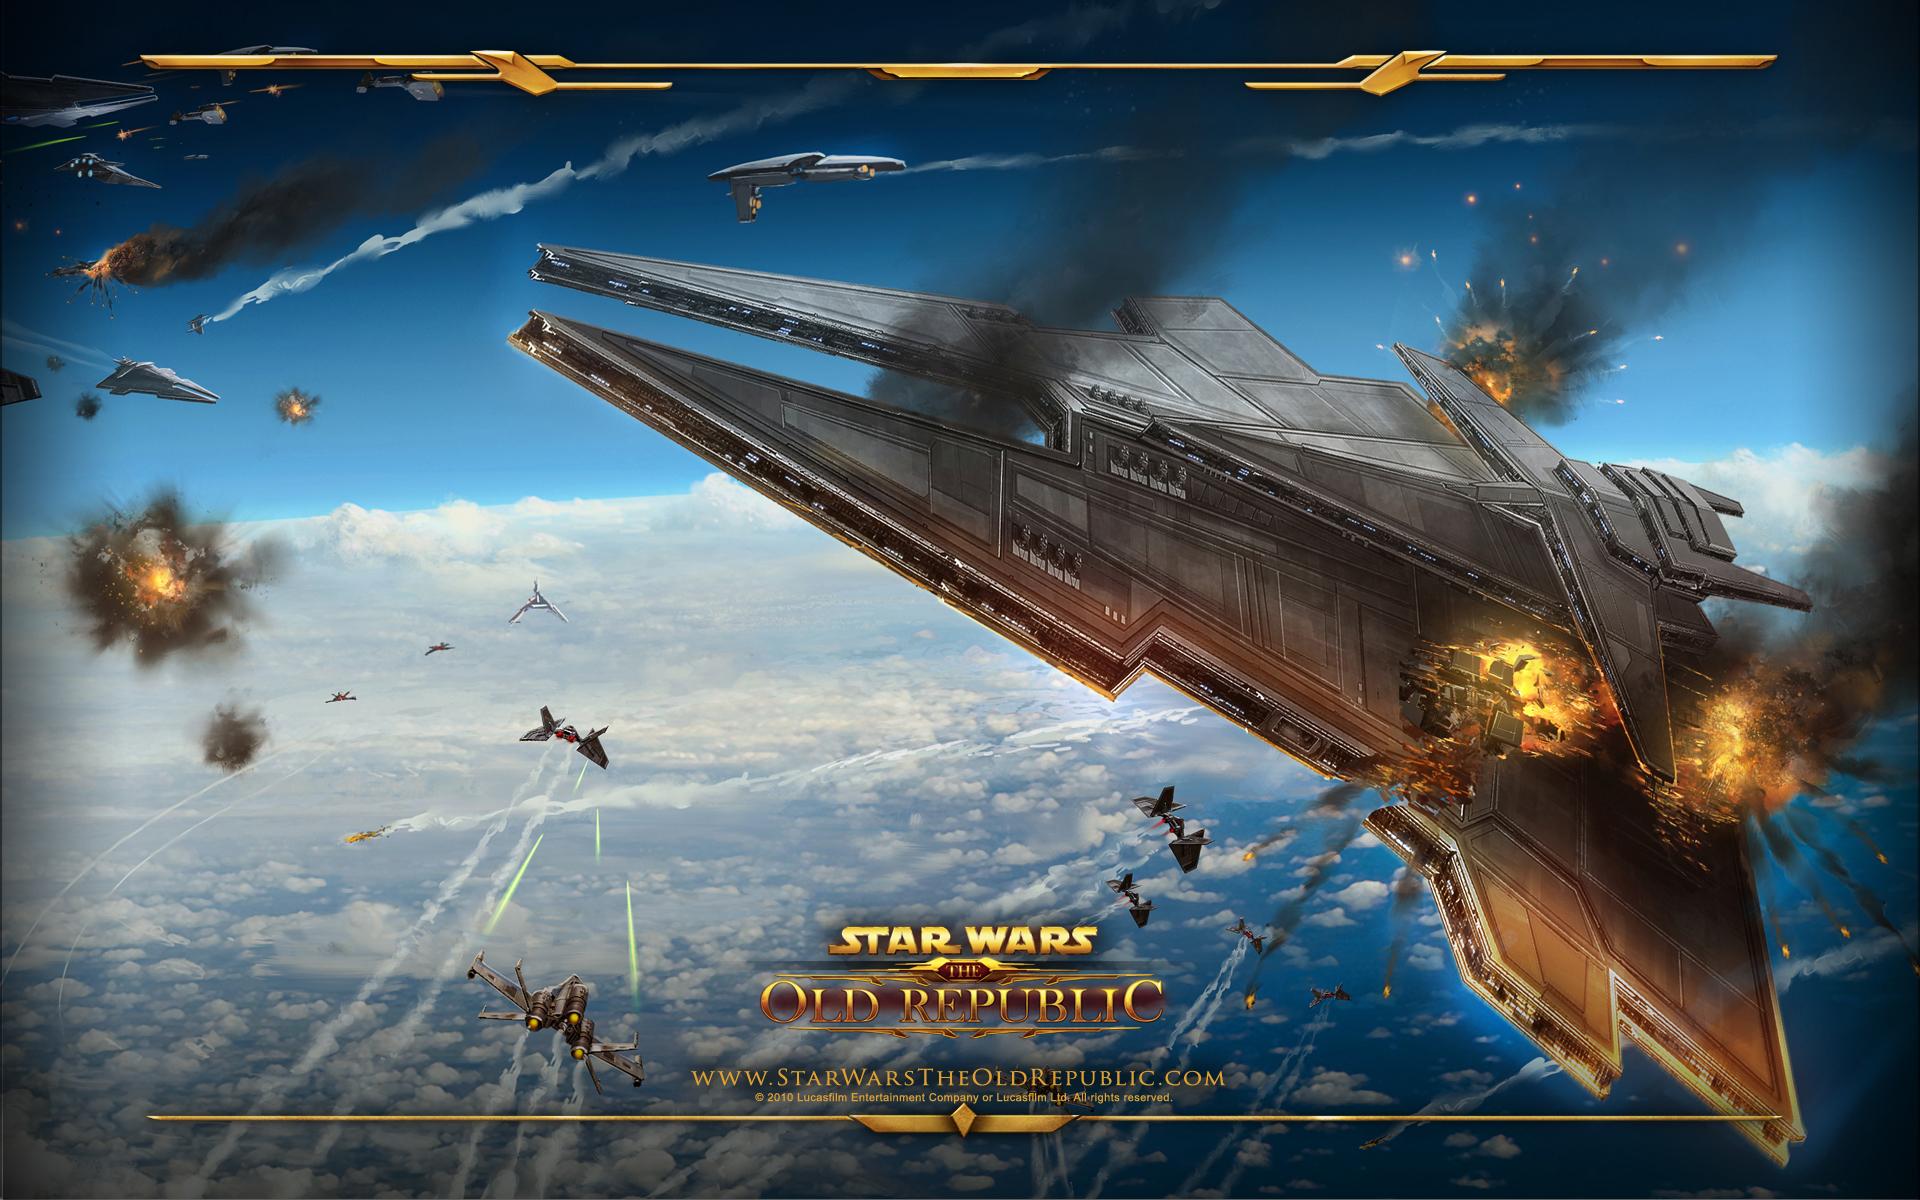 Star Wars Old Republic Wallpaper: Star Wars: The Old Republic Full HD Wallpaper And